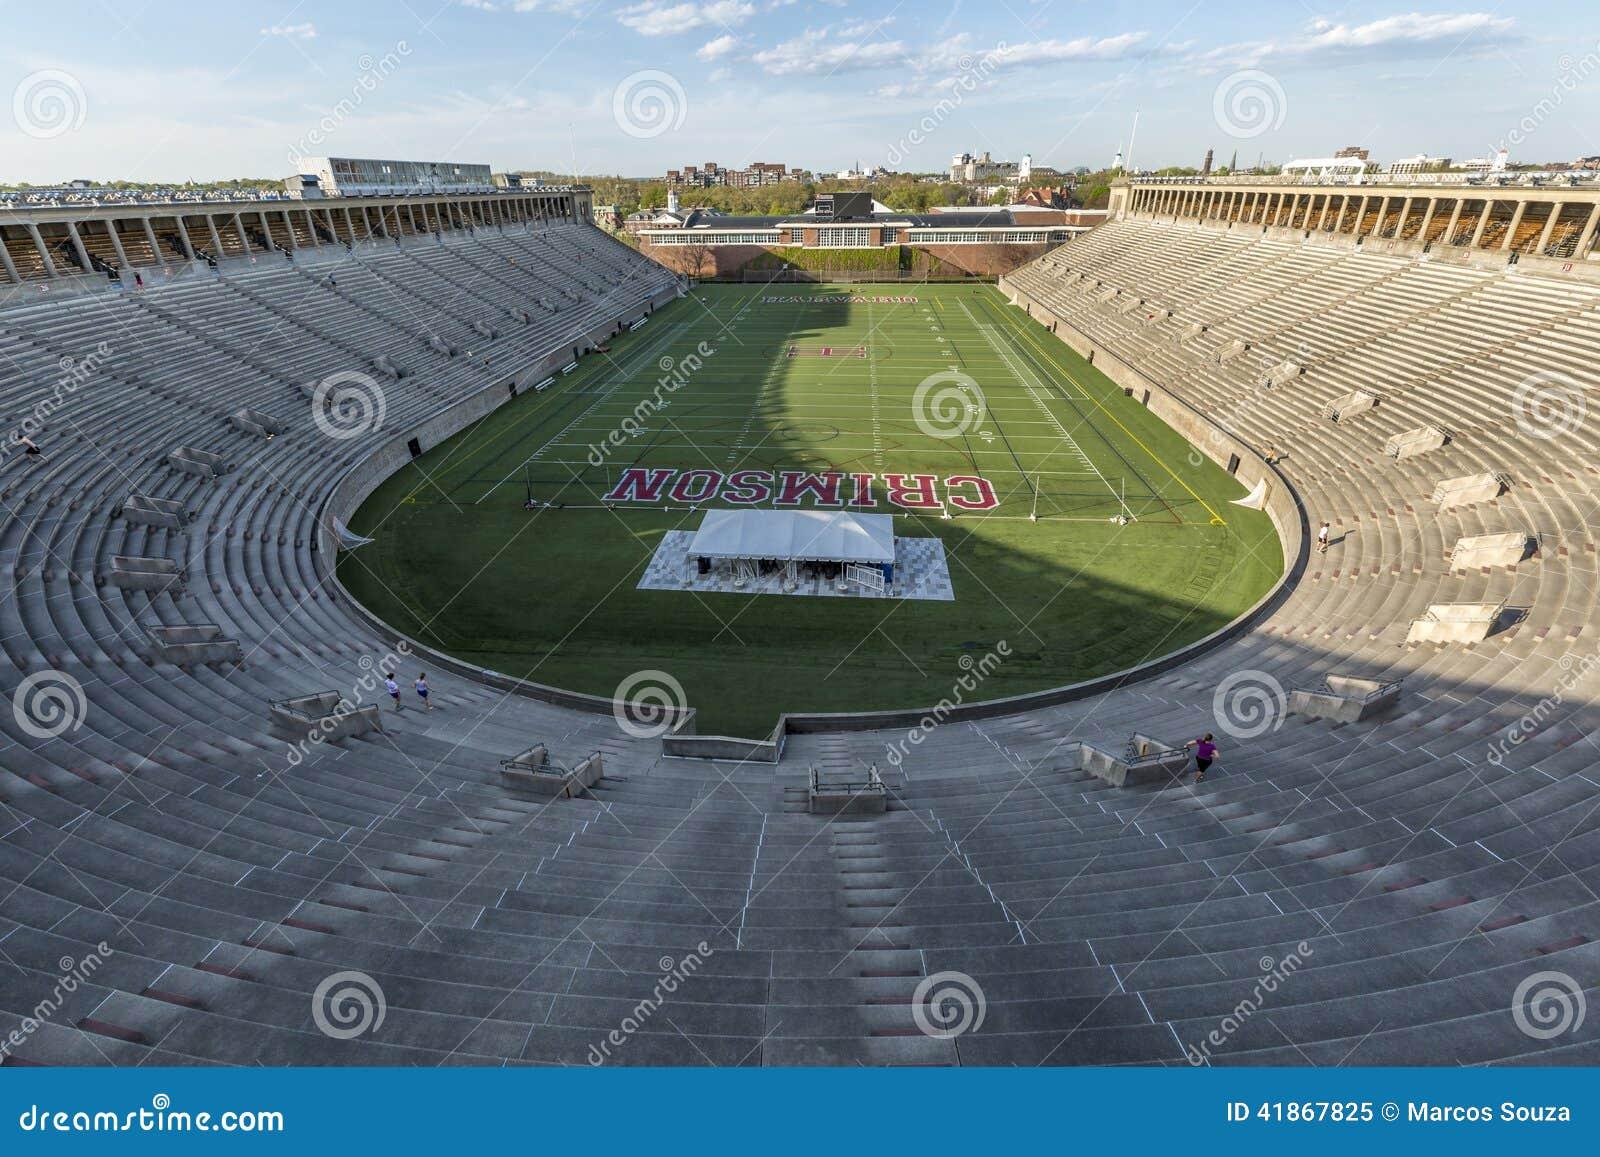 american football stadium editorial image image 41867825. Black Bedroom Furniture Sets. Home Design Ideas